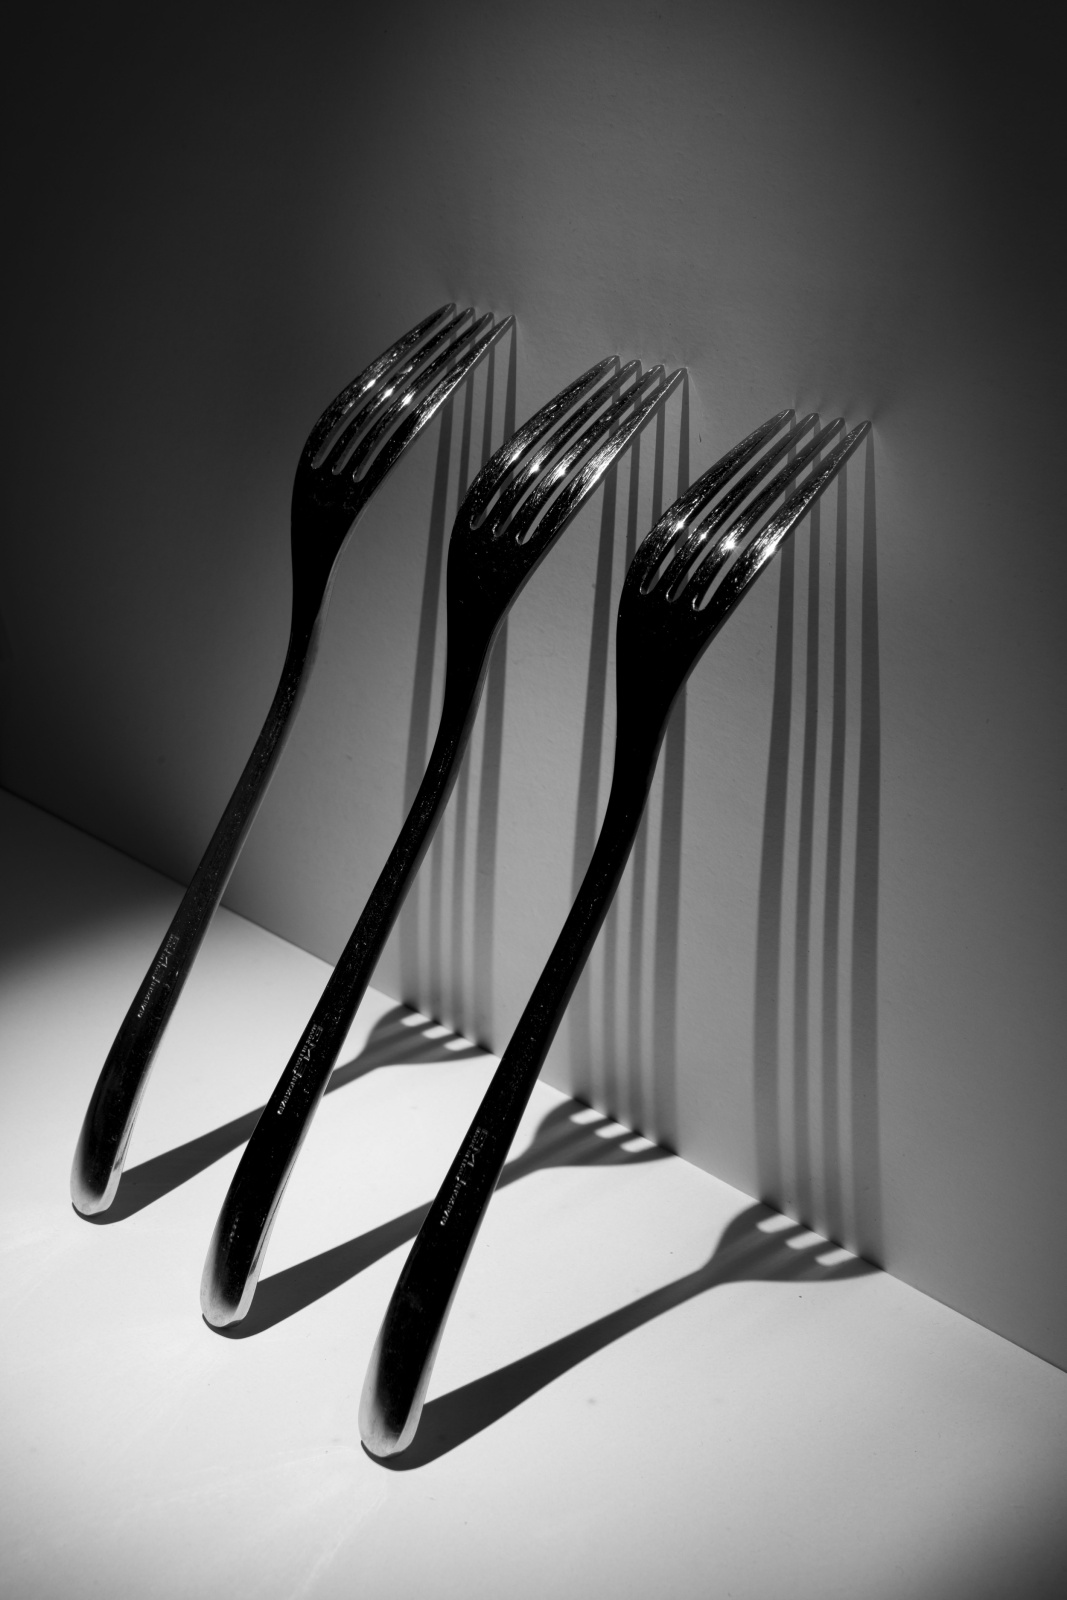 foto n 30 - Forks